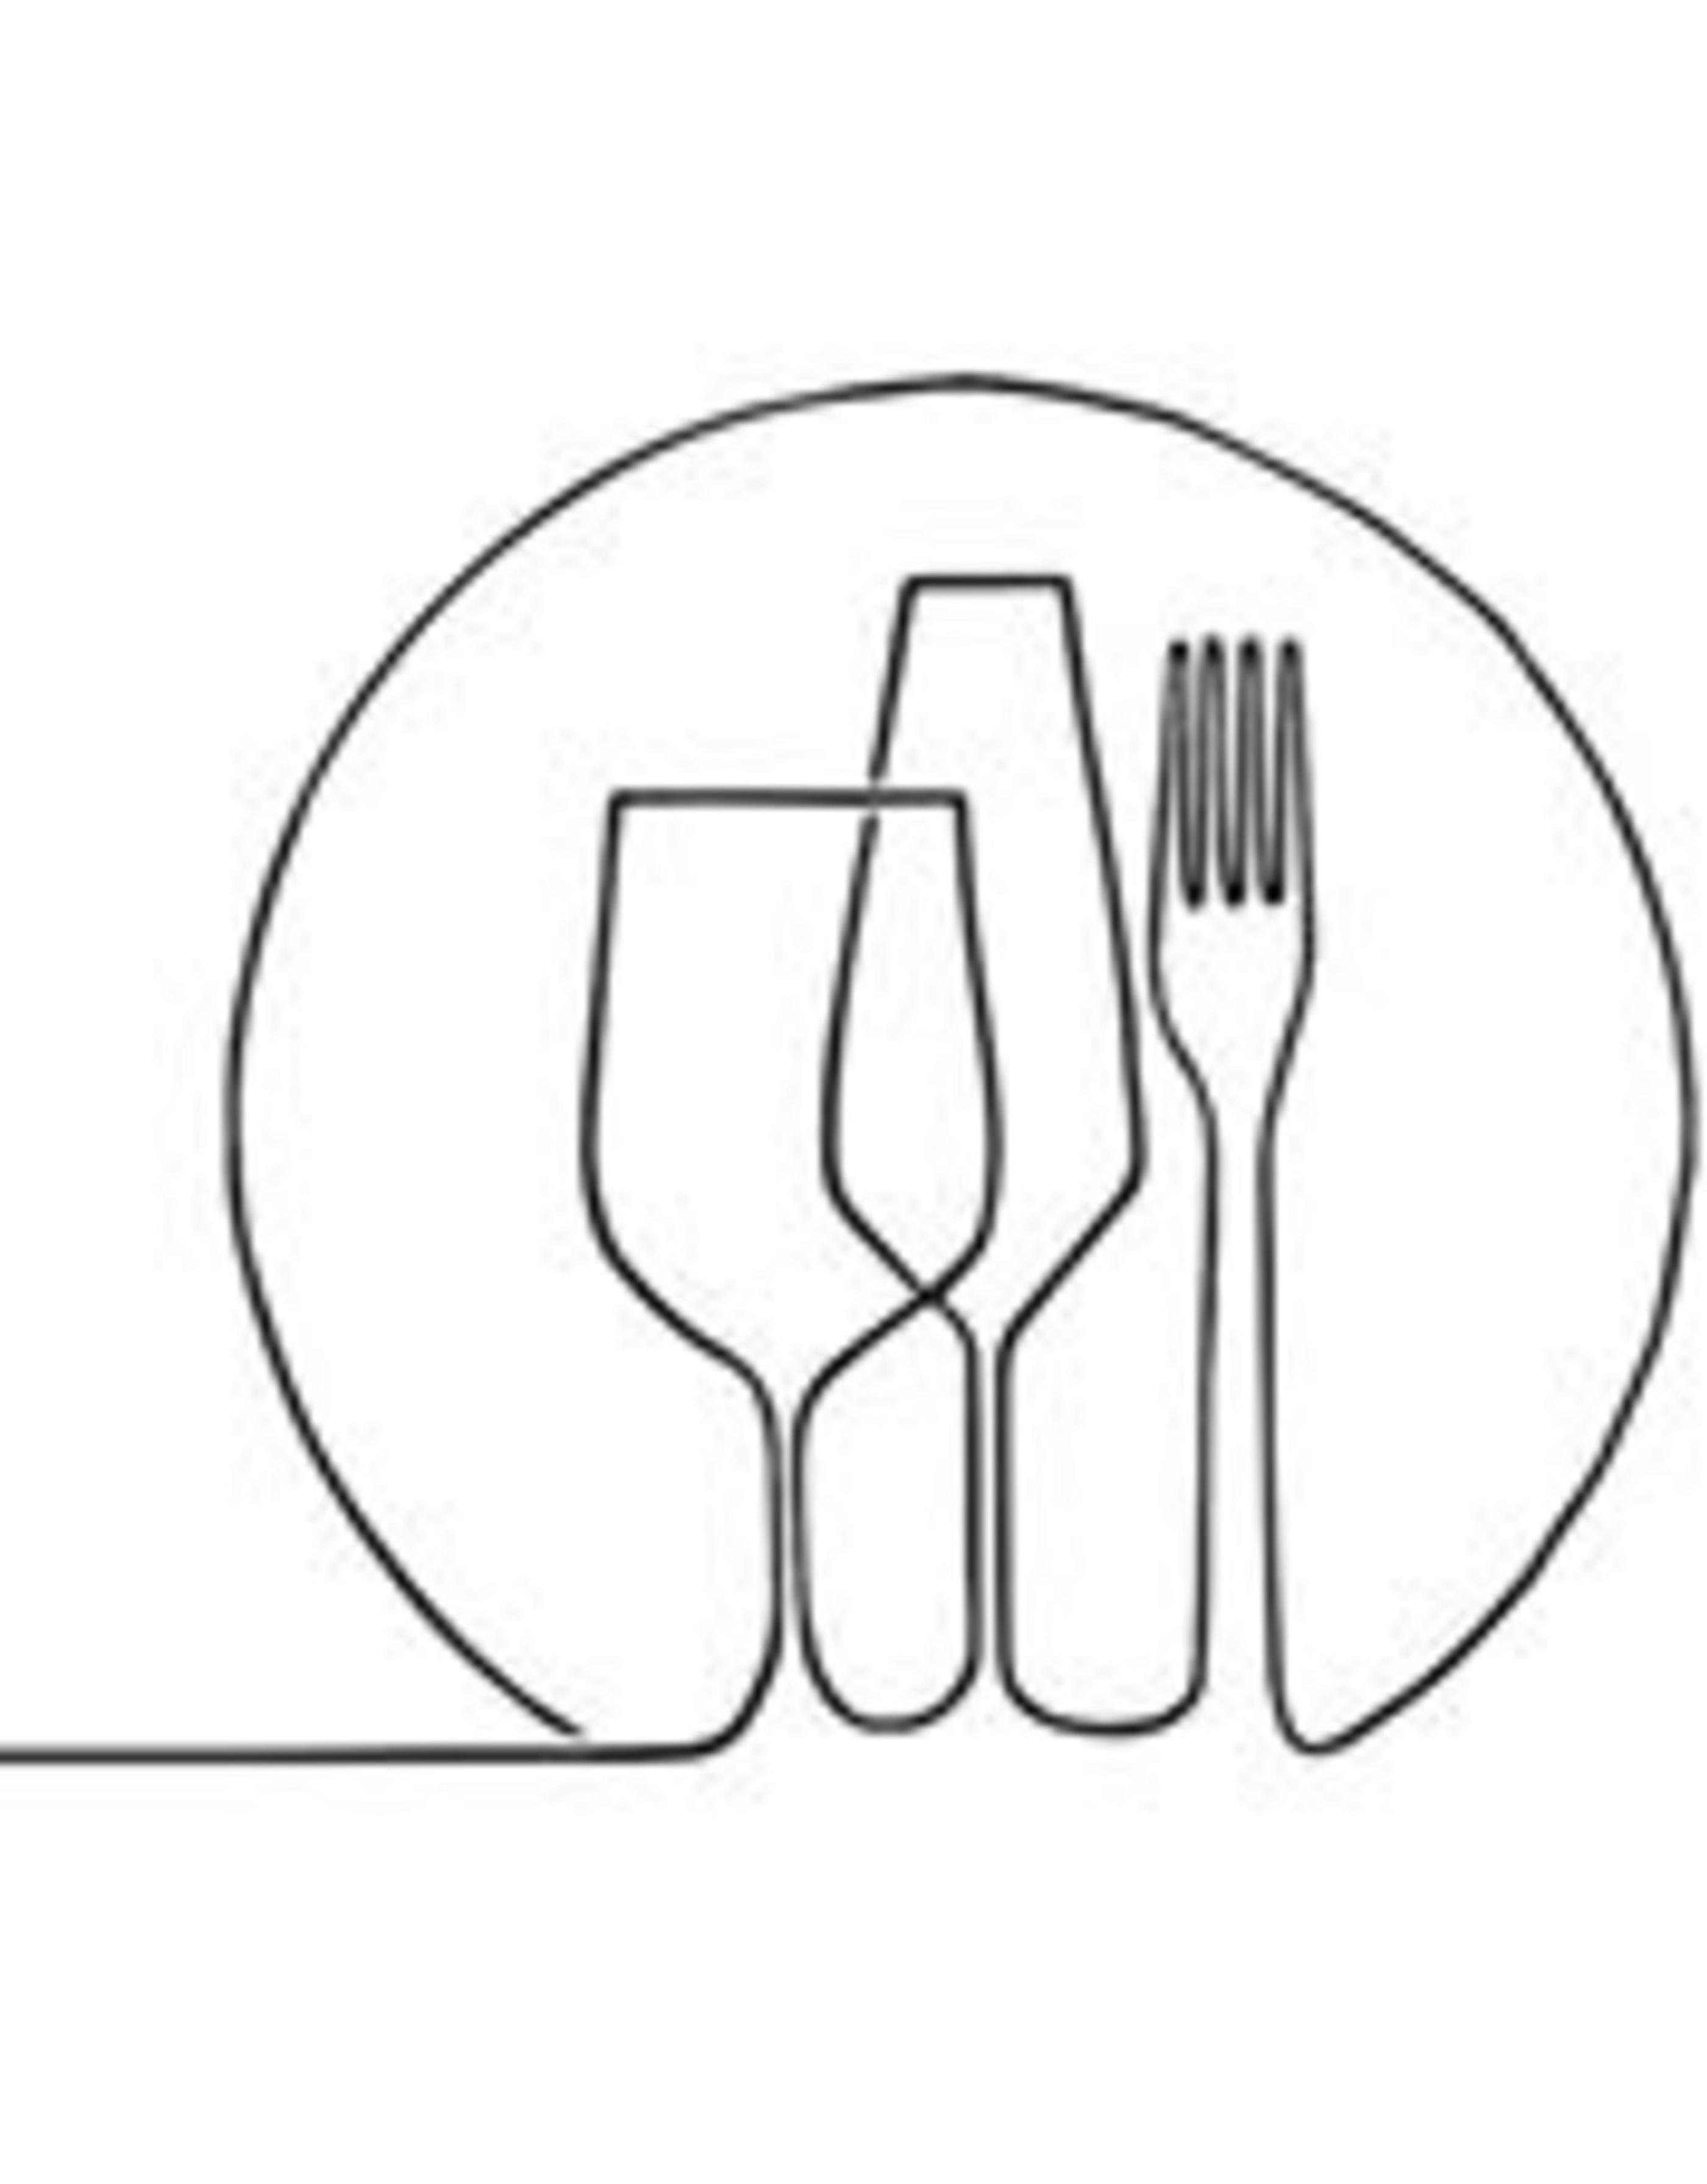 Osez L Art De La Table osez l'art de la table, jean dubost coutelier professionnel